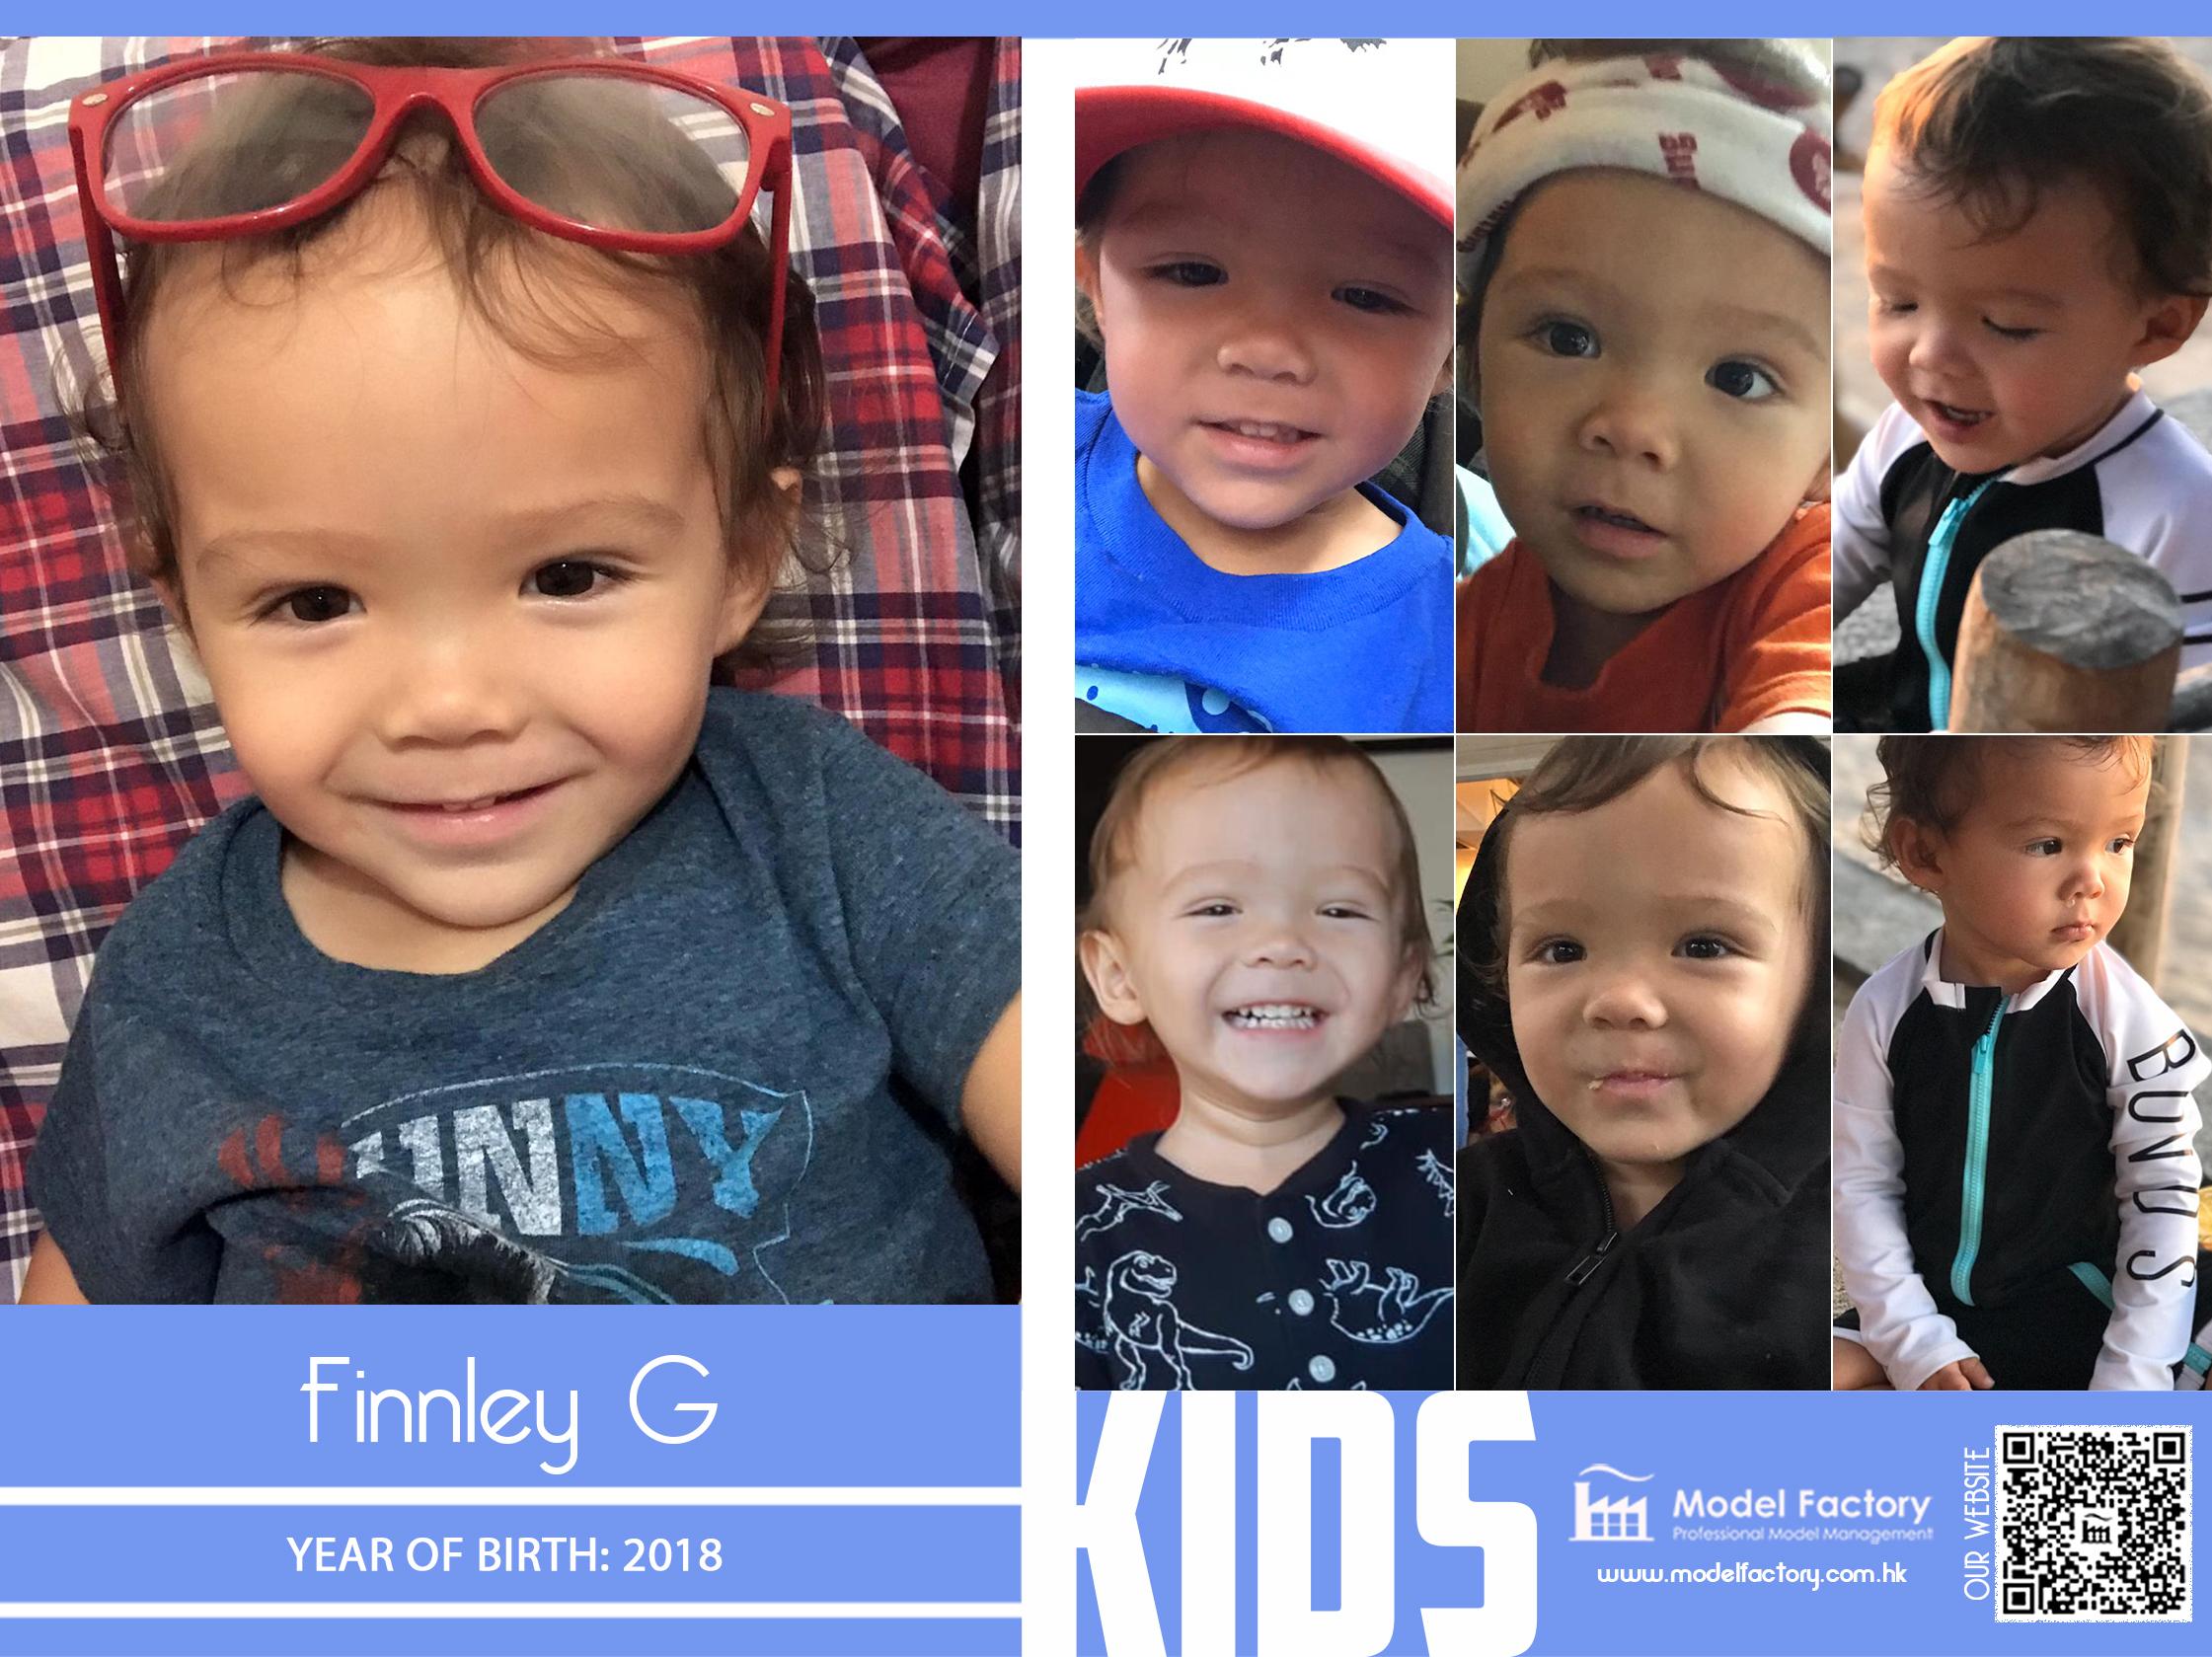 Model Factory Caucasian Kids Model Finnley G